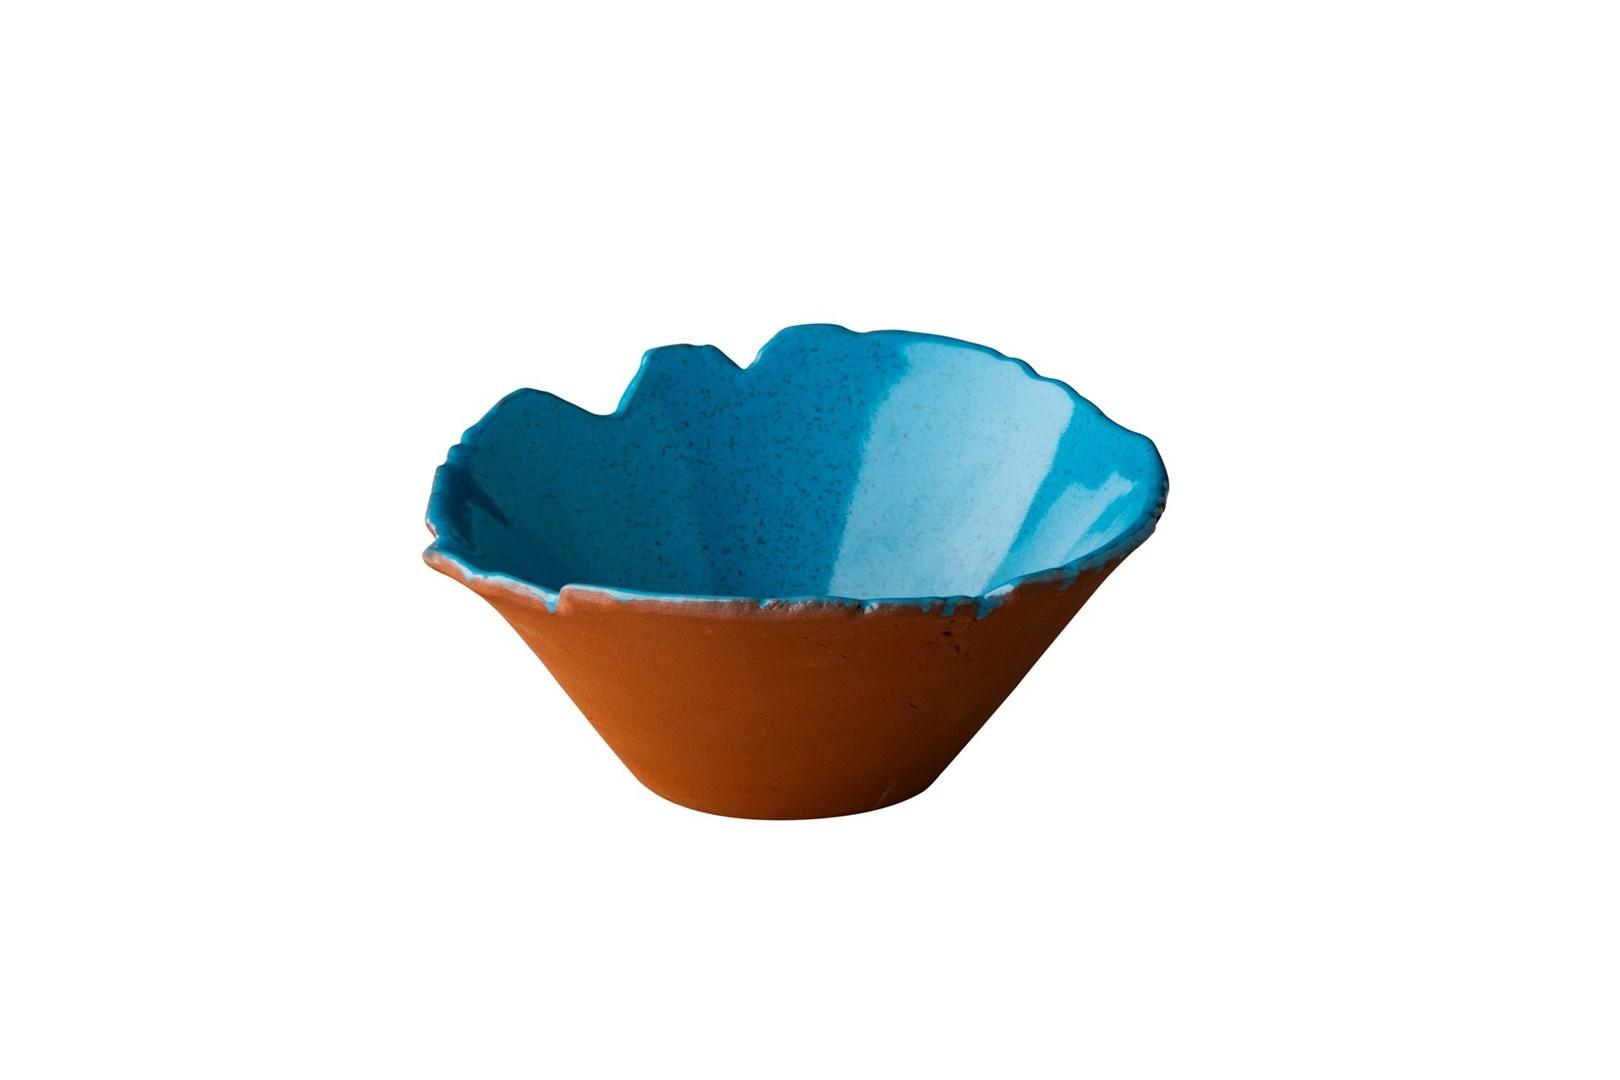 Productafbeelding Stoneheart organische kom  13 x 7,8 cm blauw